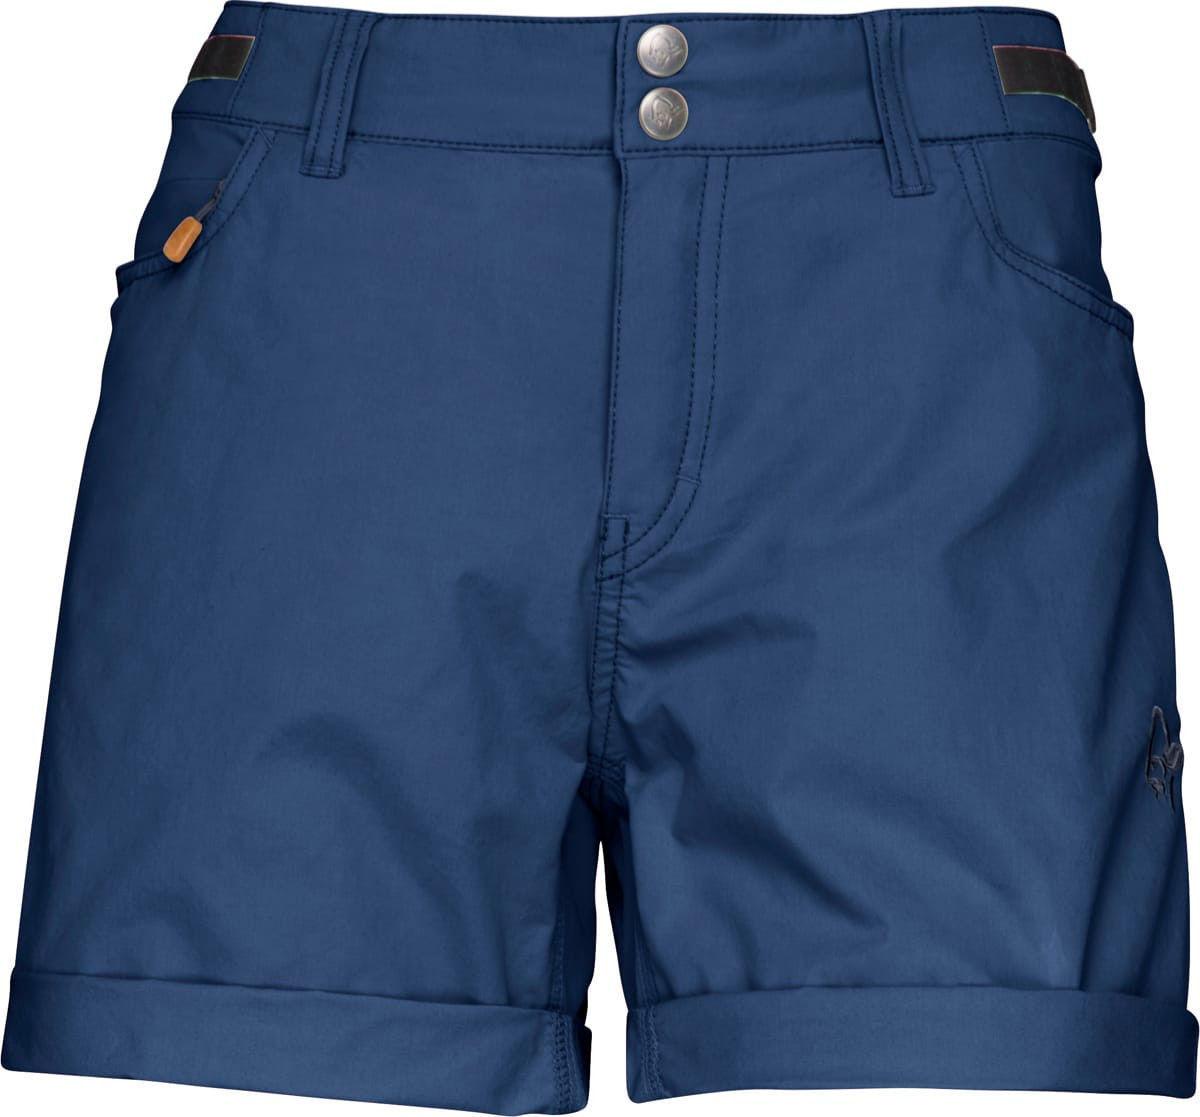 Bilde av svalbard light cotton Shorts (W)